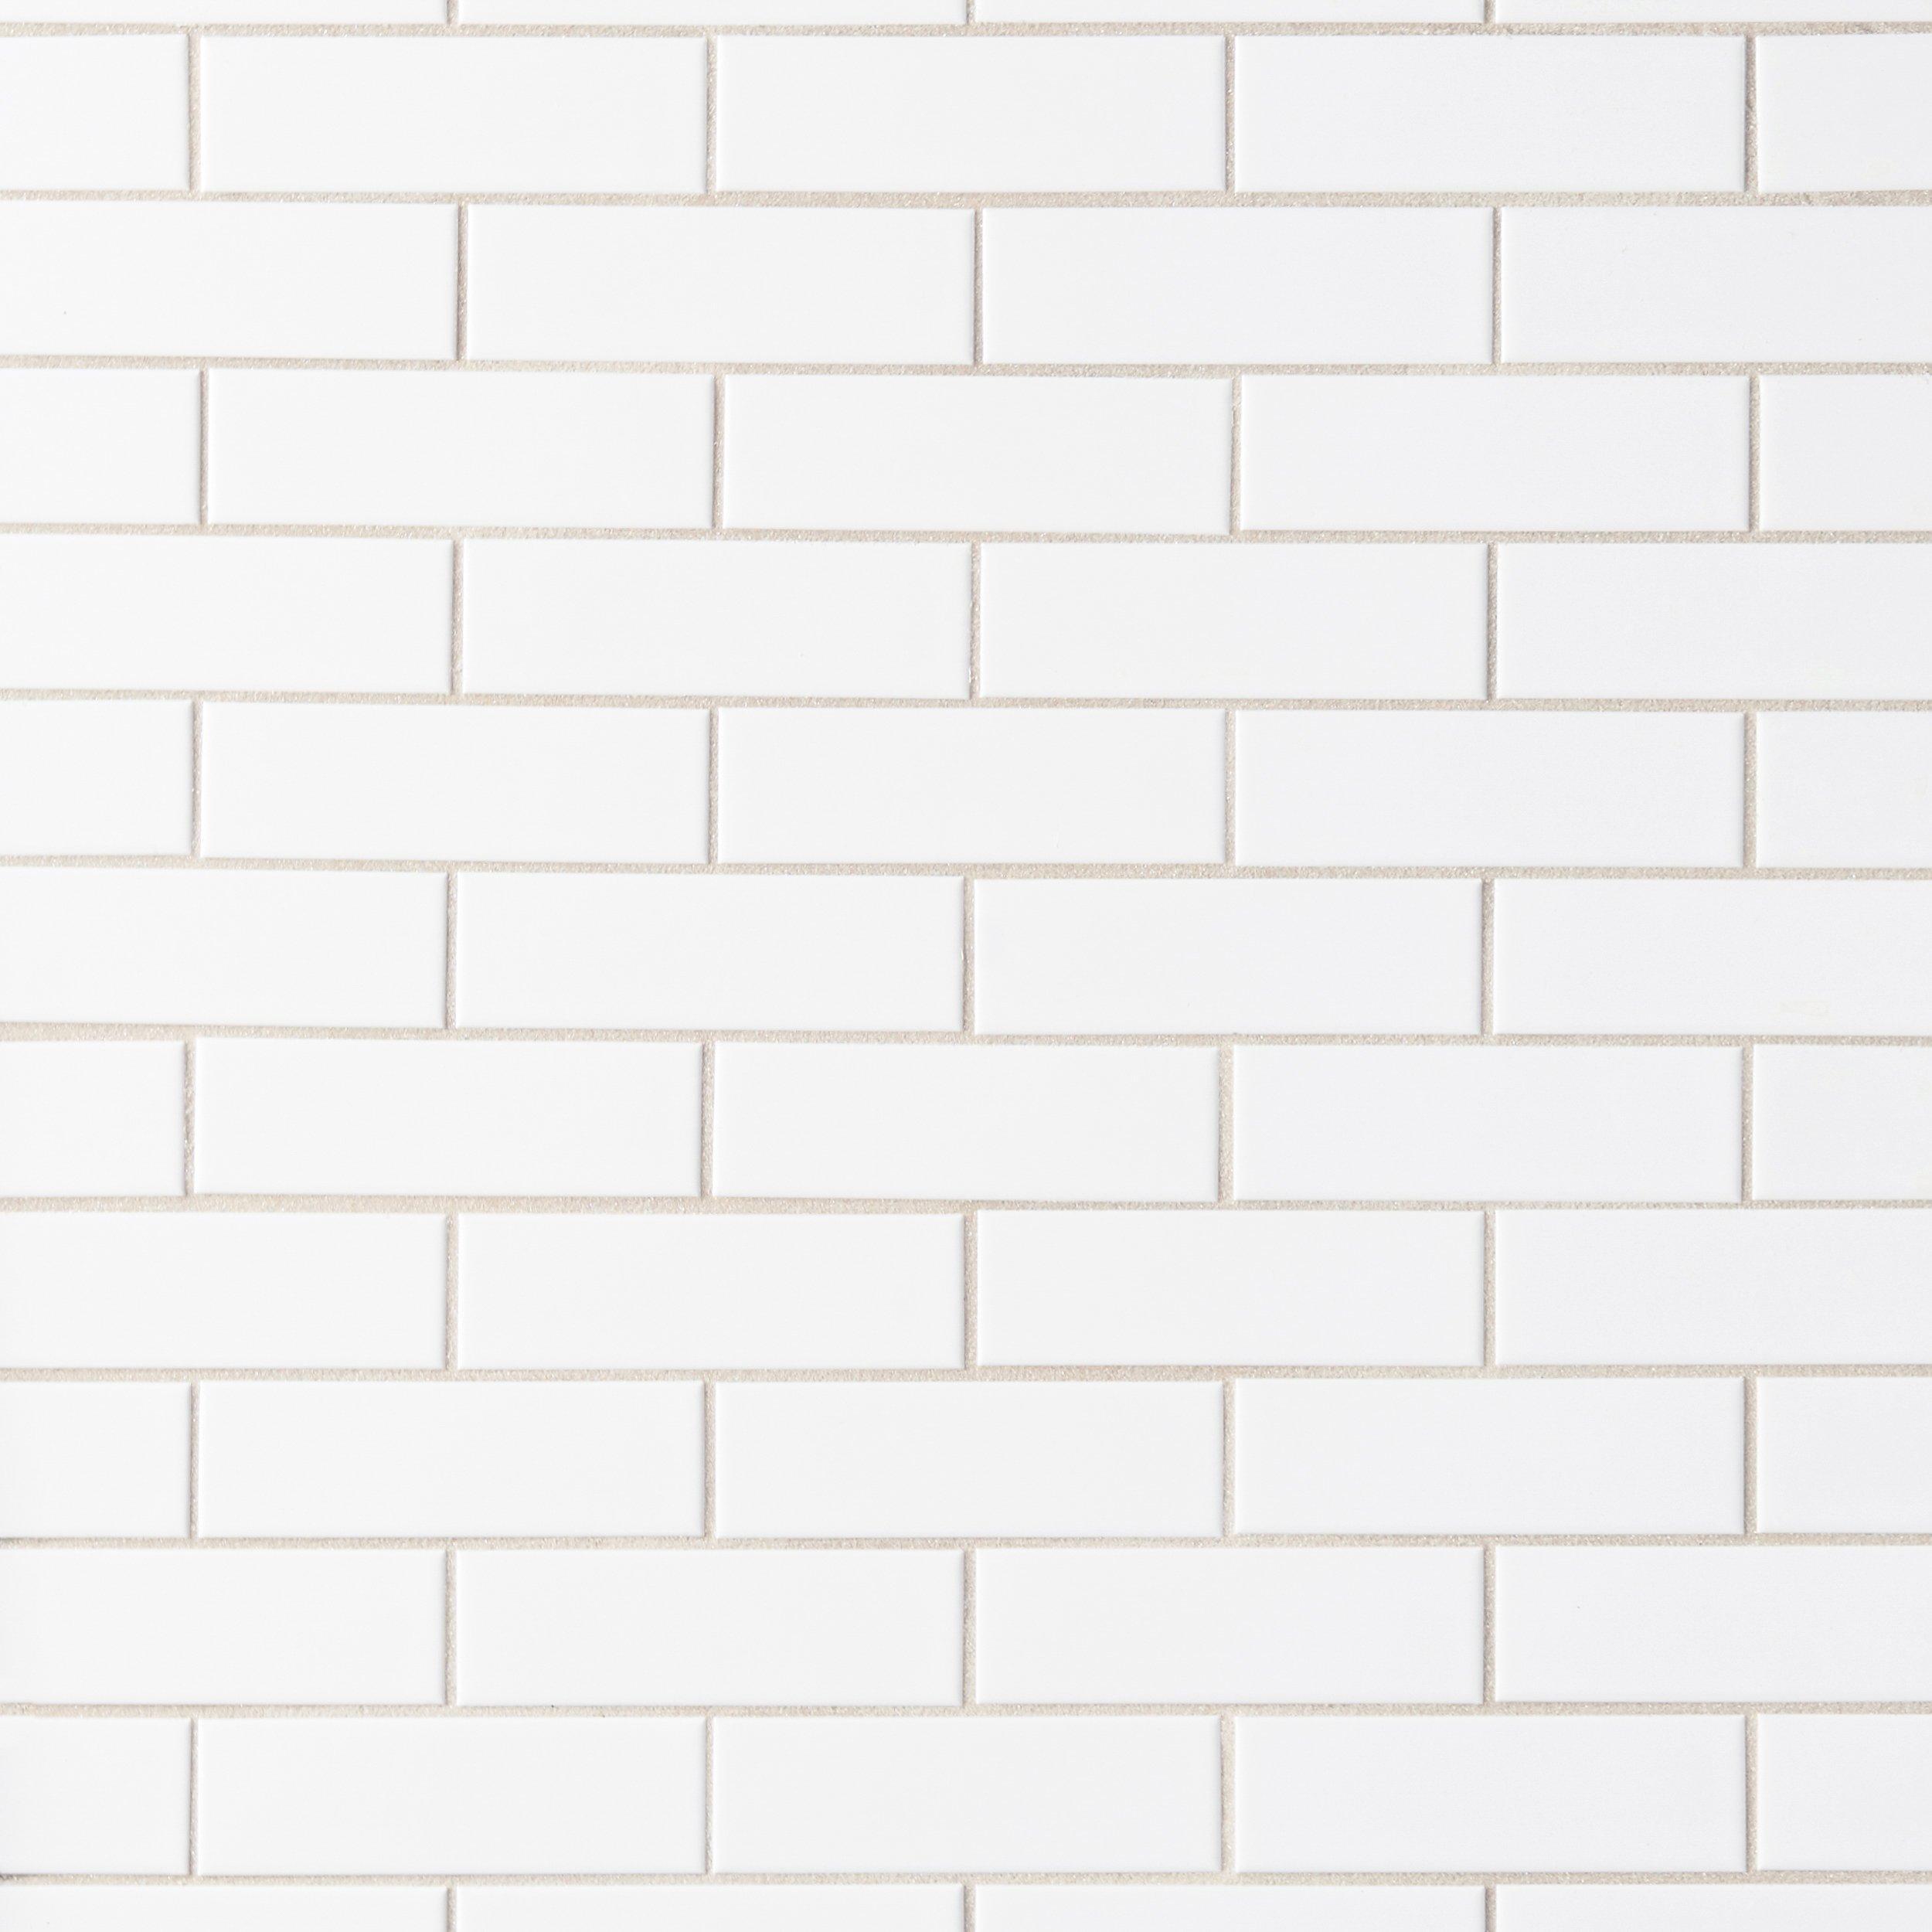 Pin By Adil Taj On Ceiling In 2019: White Brick Ceramic Mosaic Em 2019